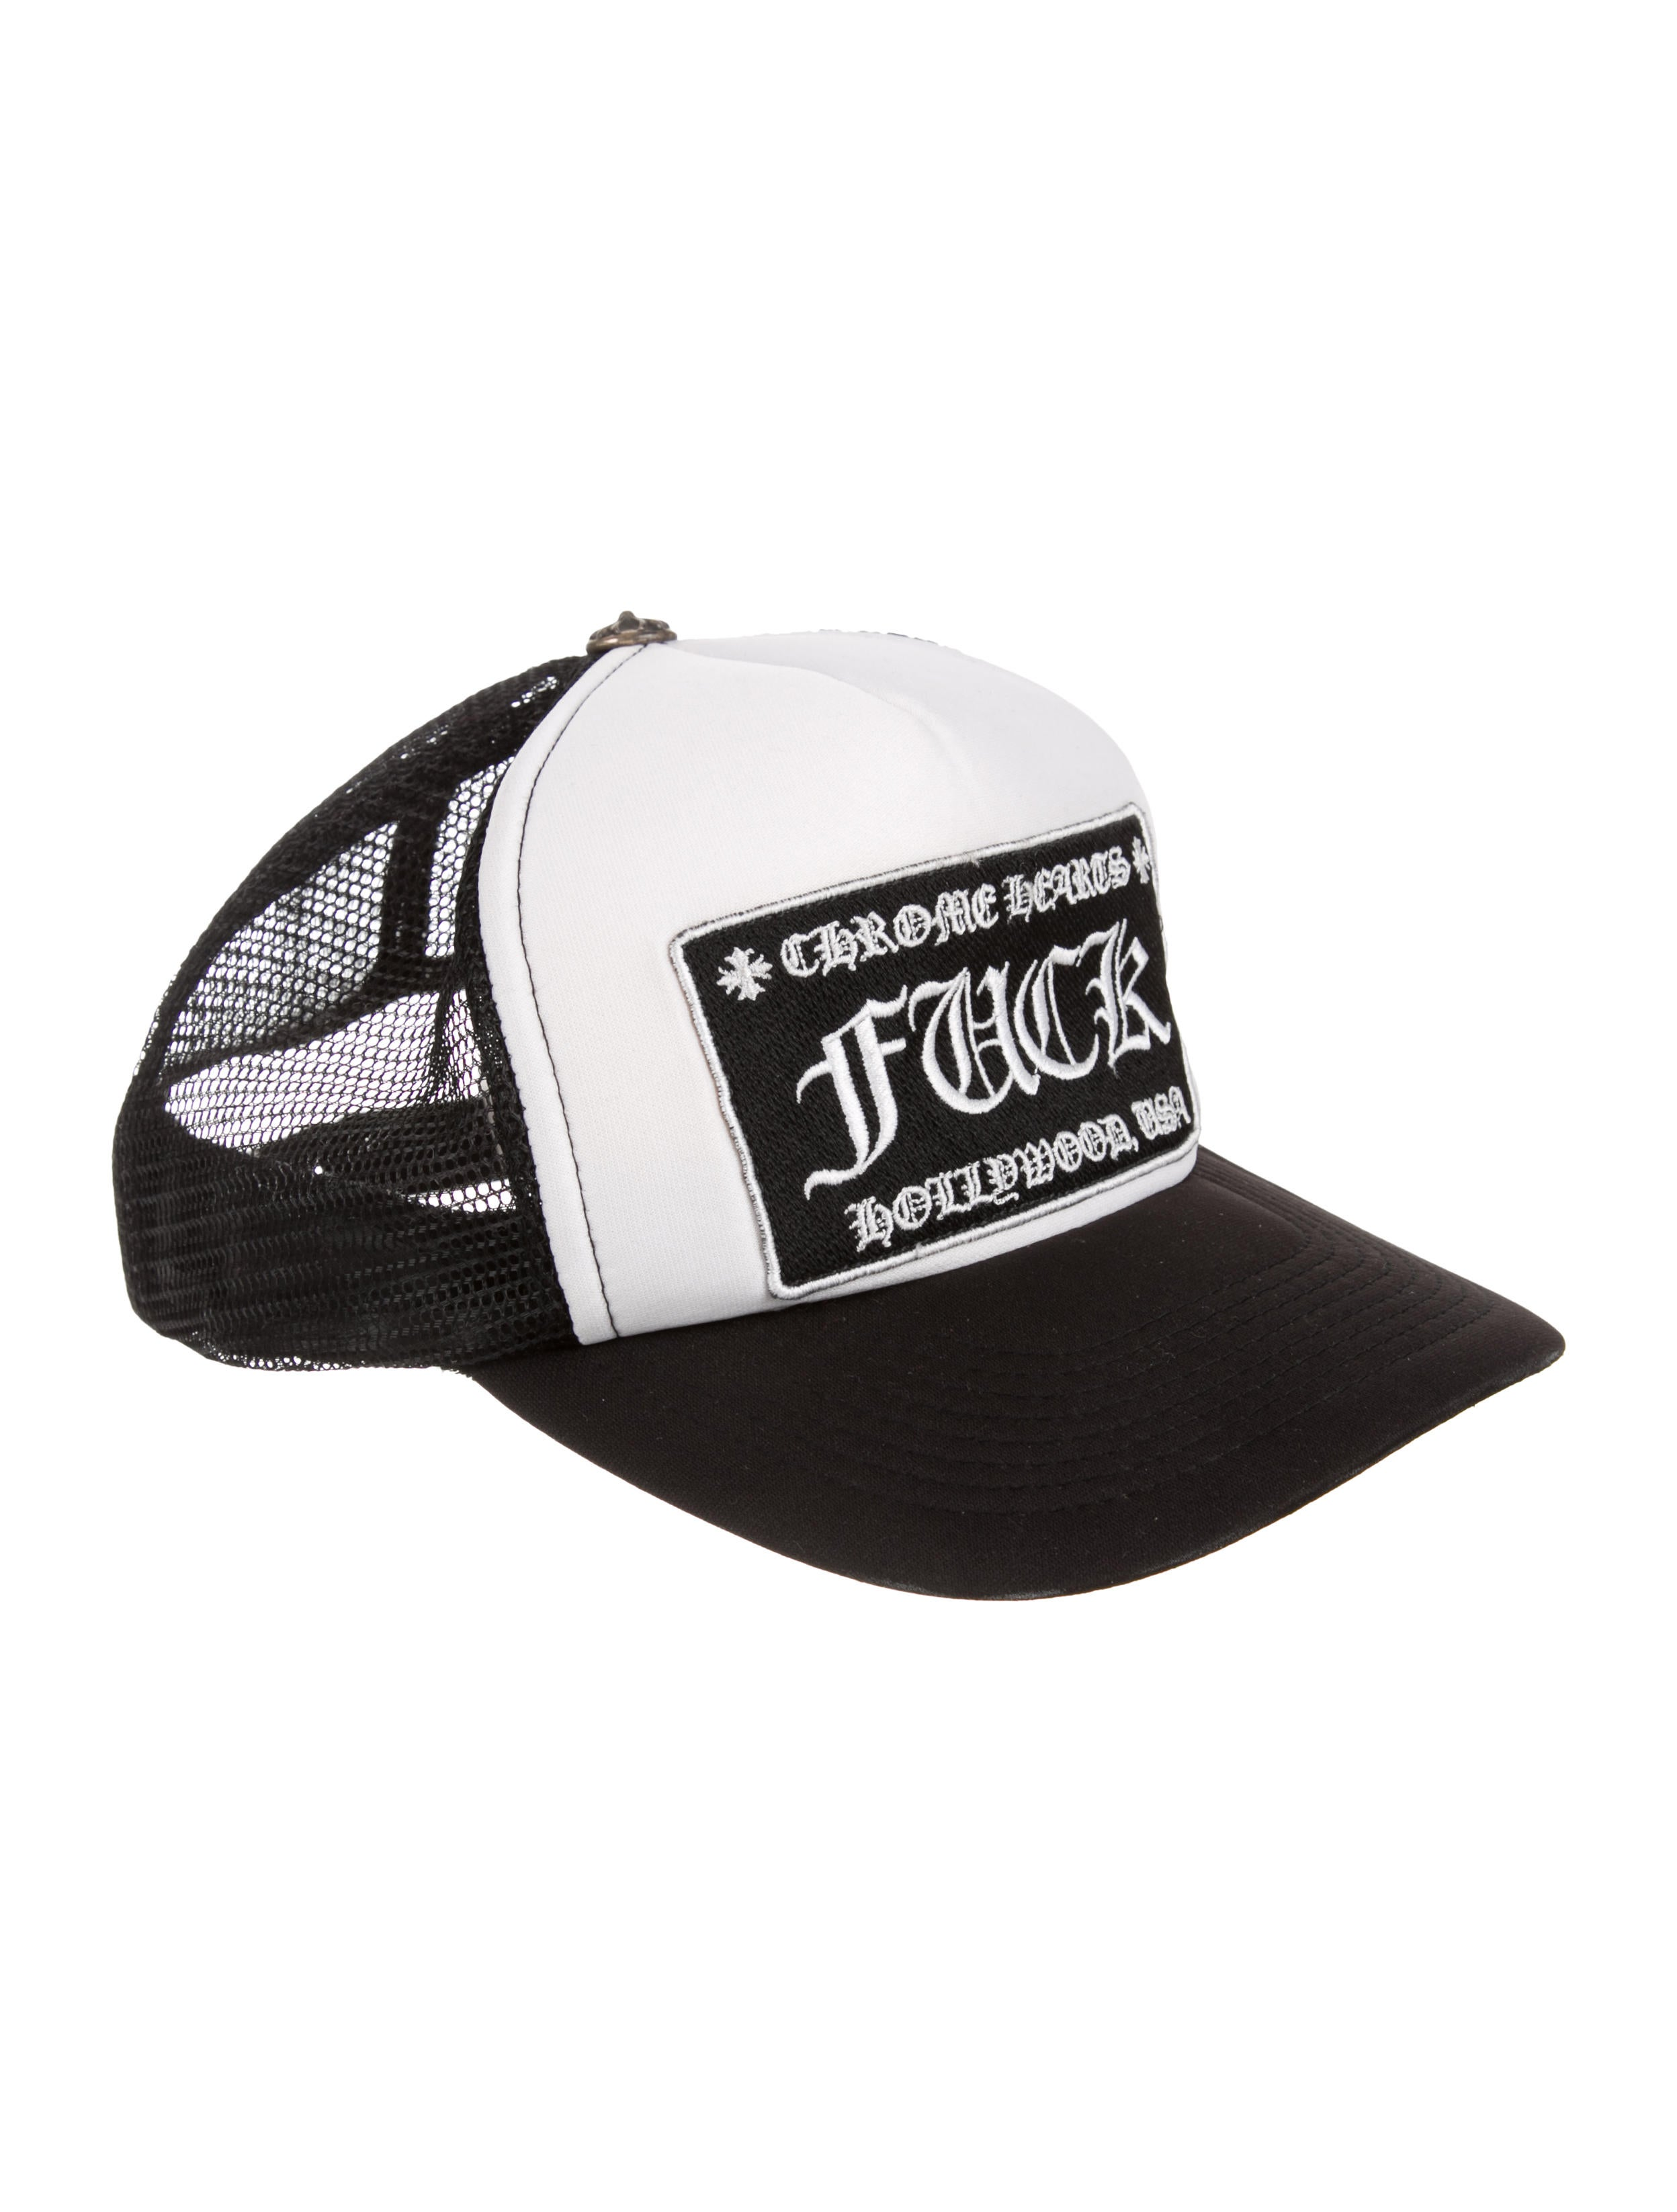 0eff1b8585de5 Chrome Hearts Expletive Logo Snap Back Trucker Hat - Accessories ...